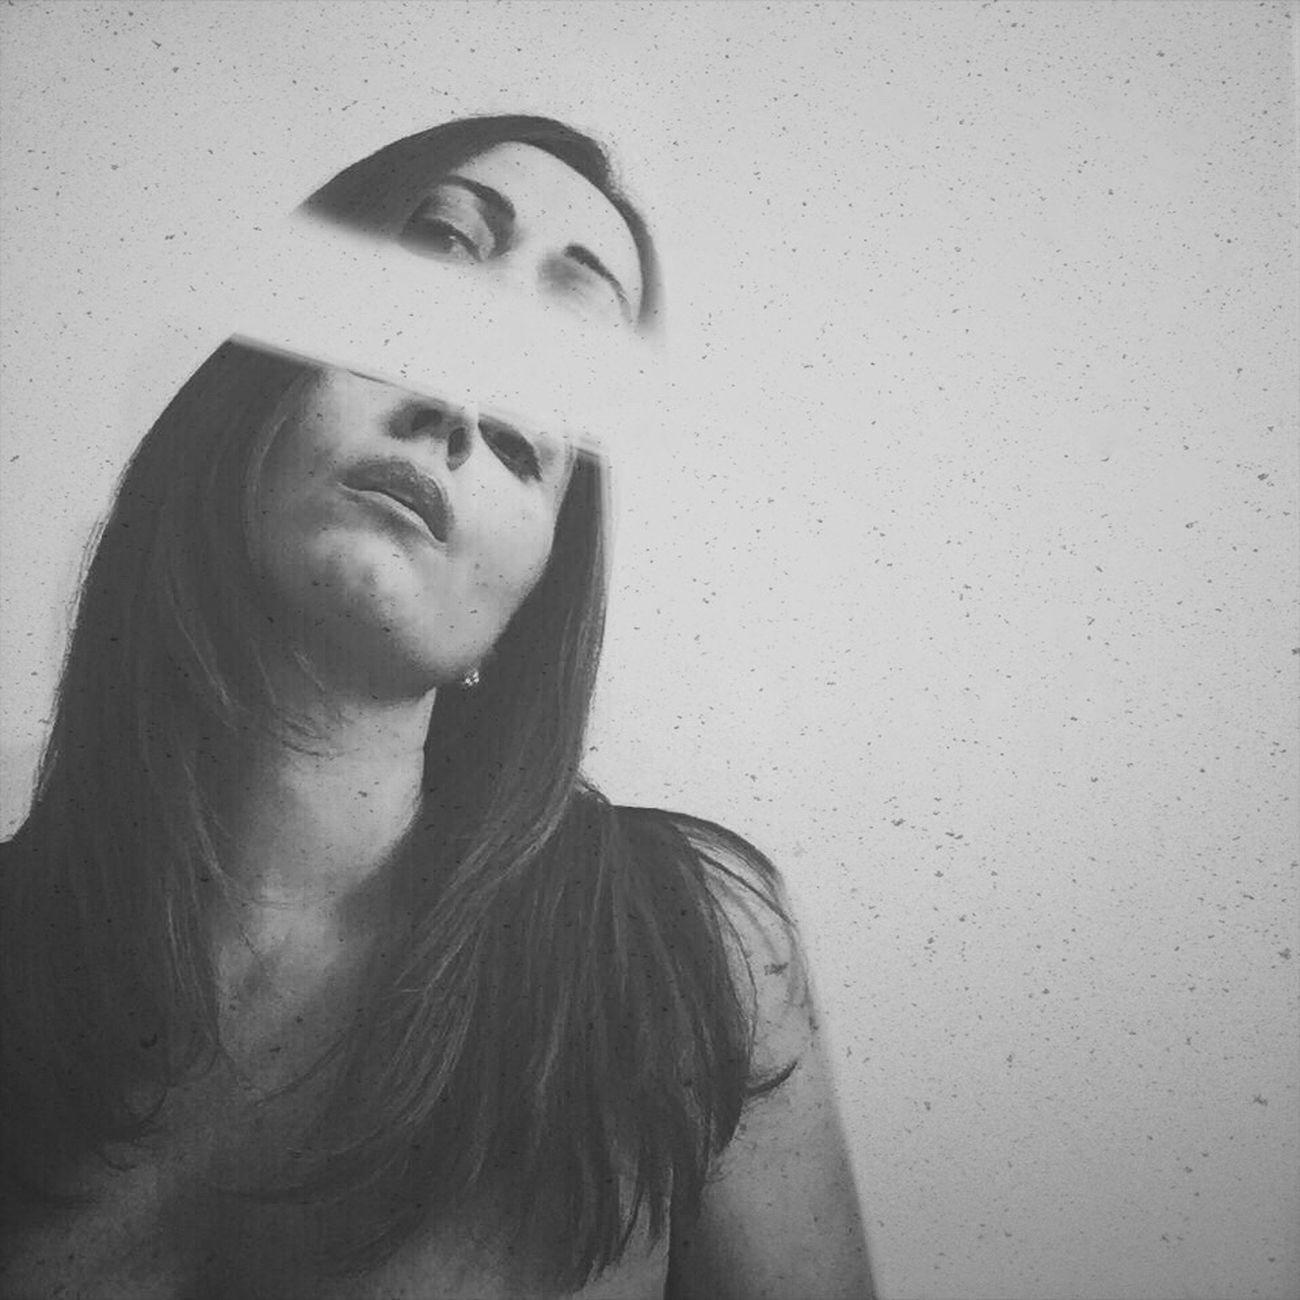 NEM Self Surrealism AMPt_community Shootermag EyeEm Best Edits Showcase: December